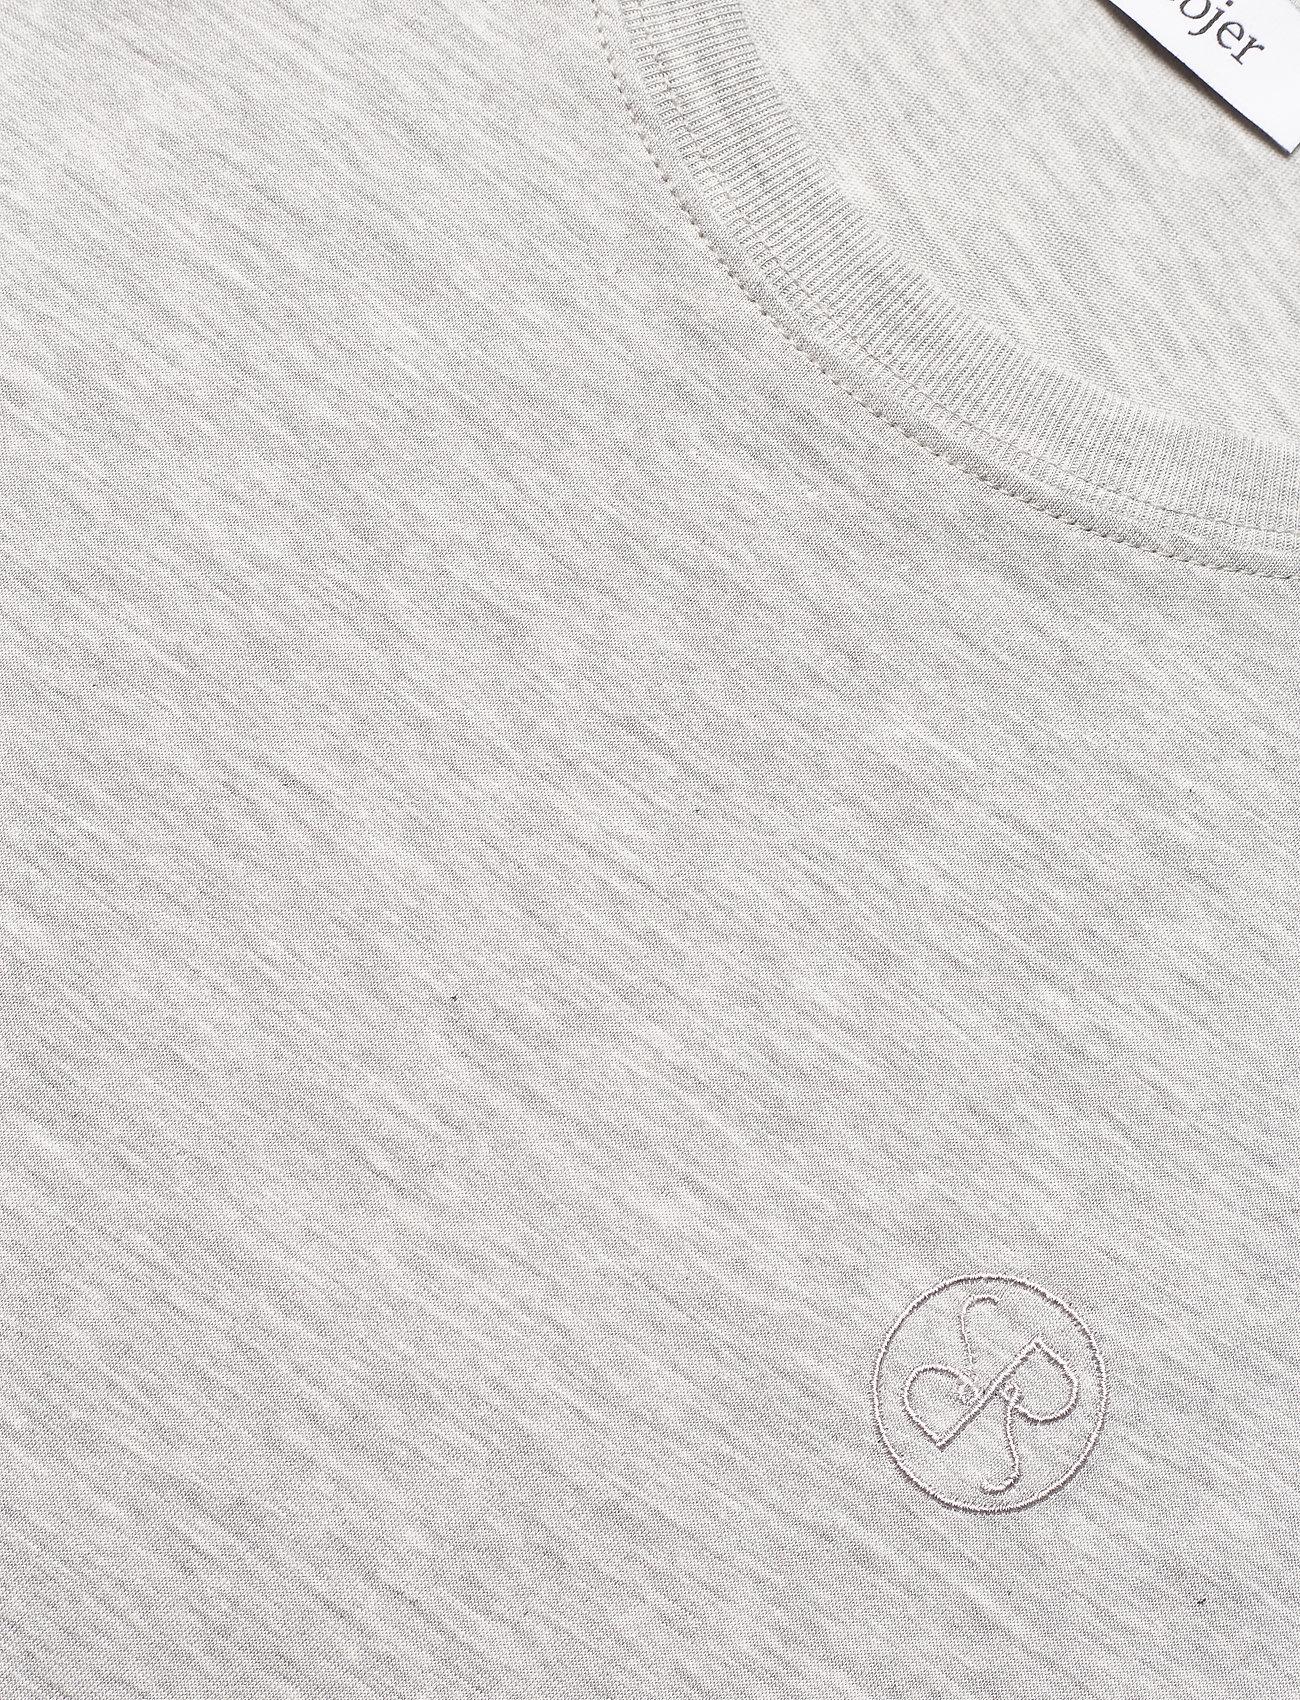 RODEBJER - RODEBJER NINJA LOGO - t-shirts - grey melange - 2